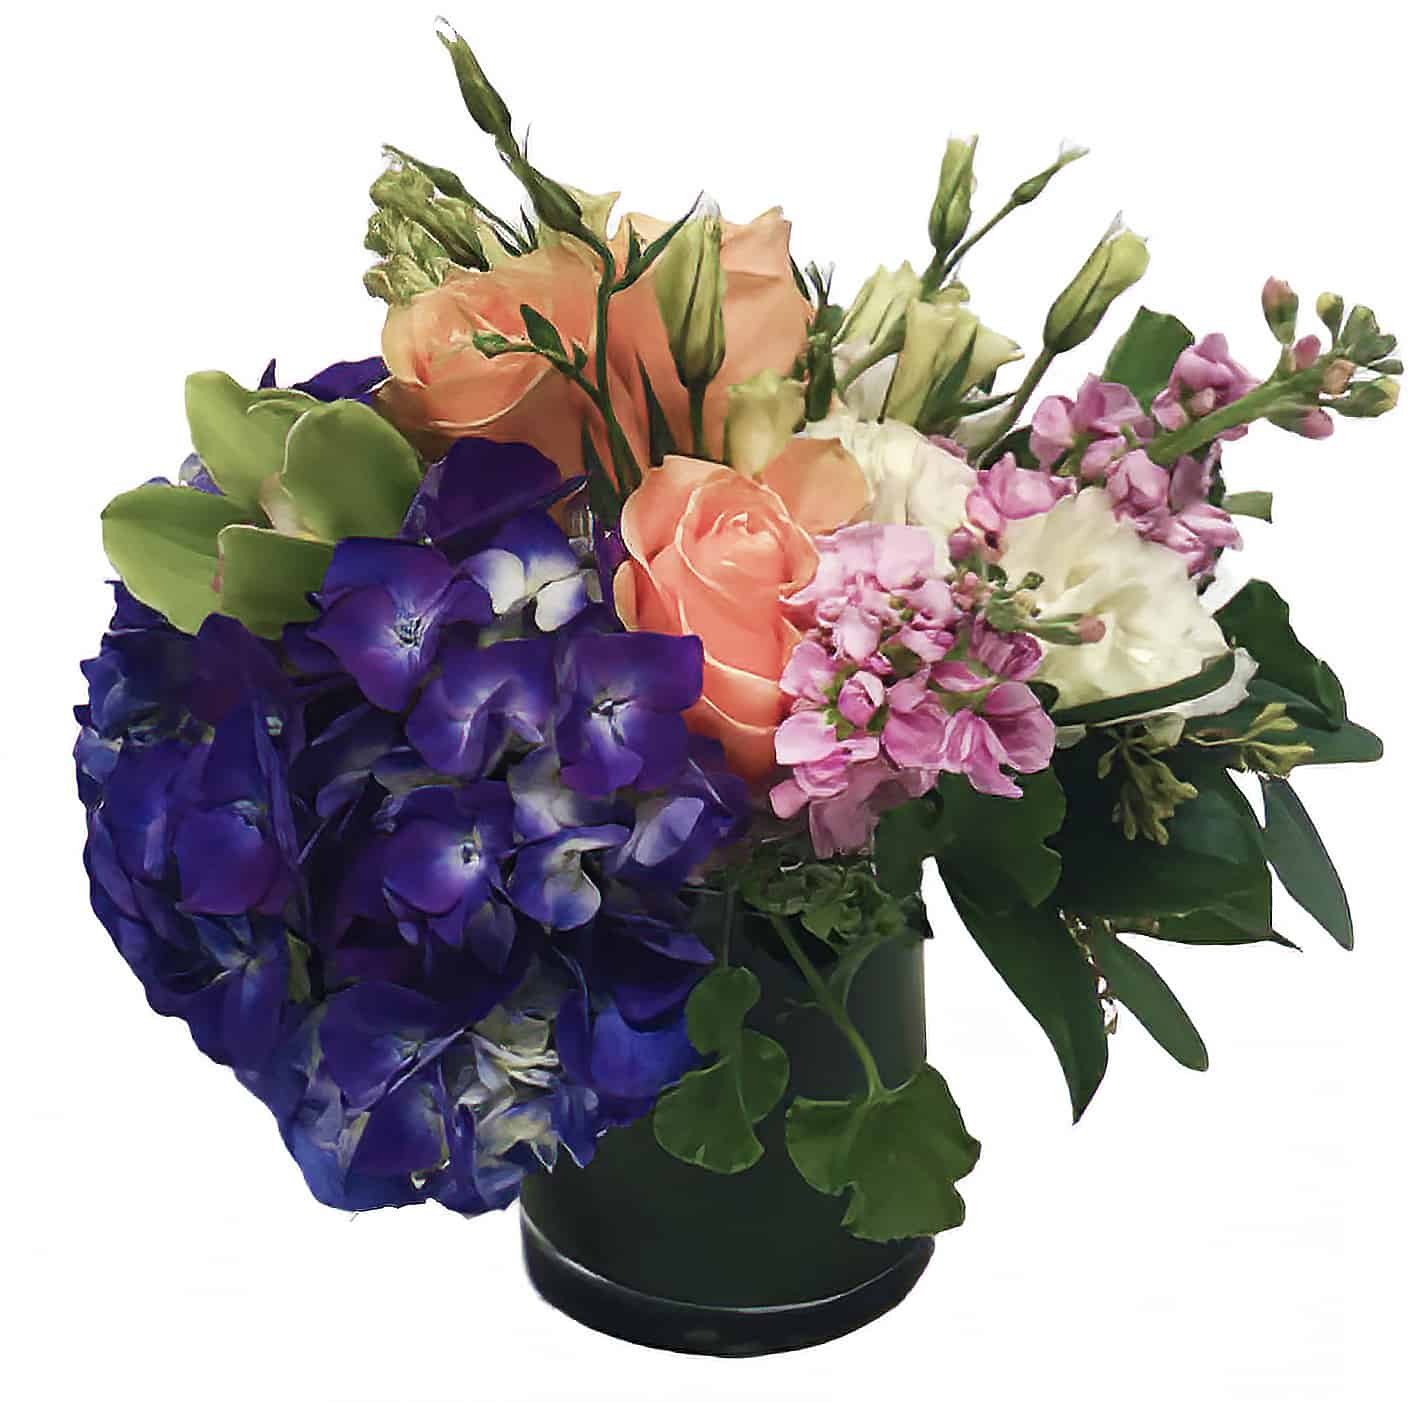 Antique English Centerpiece - Flower Arrangement